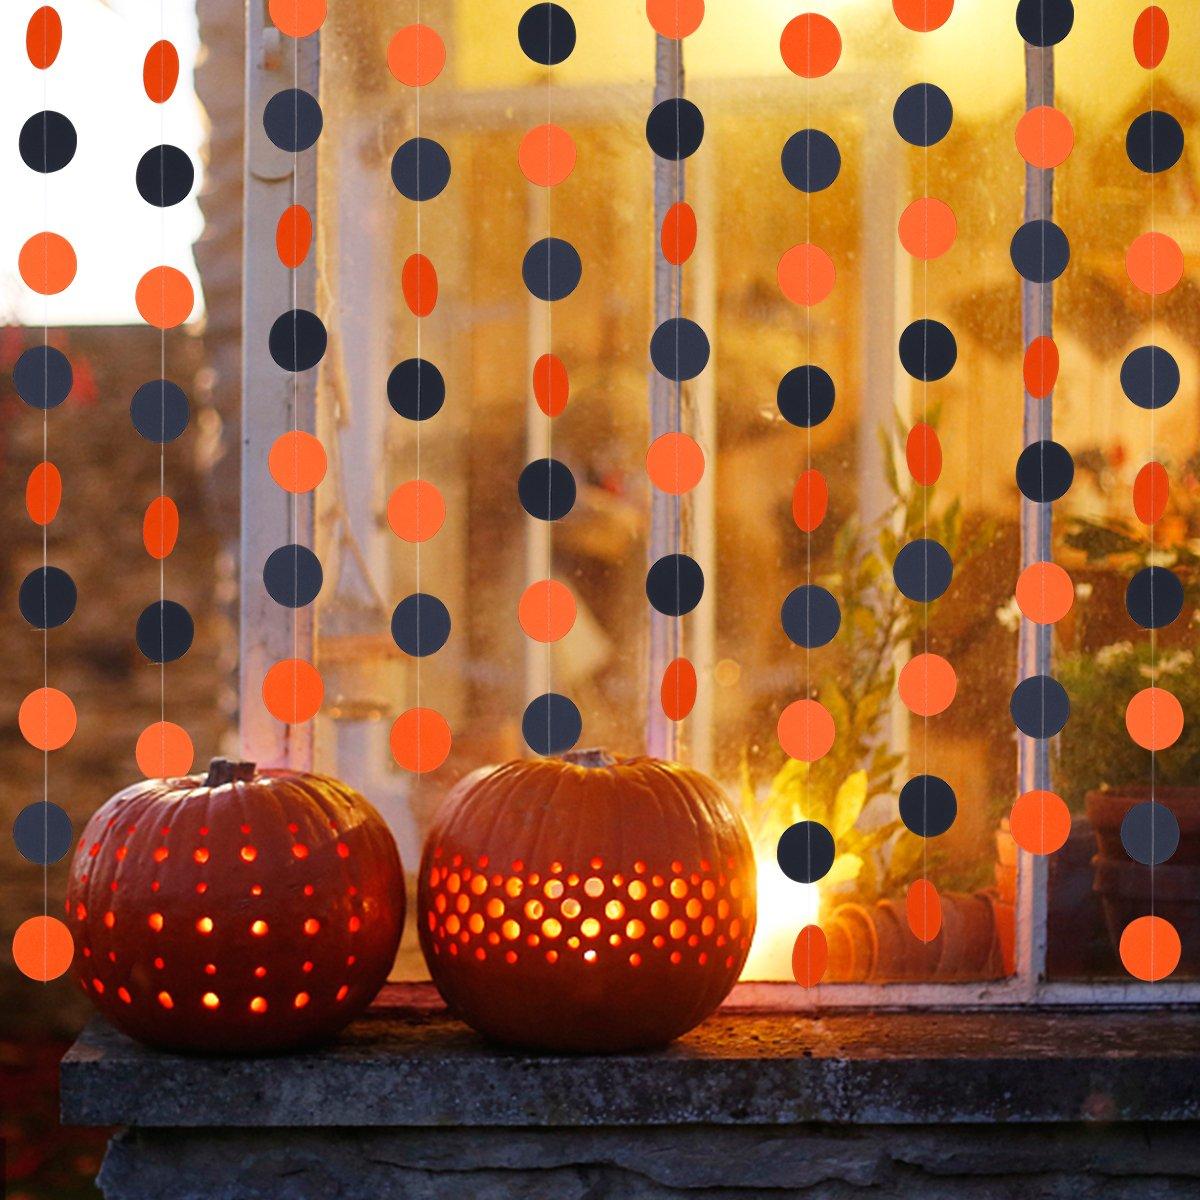 Halloween Party Decoration Supplies 3Pcs Orange /& Black Circle Dots Garland 75pcs Circle Dots